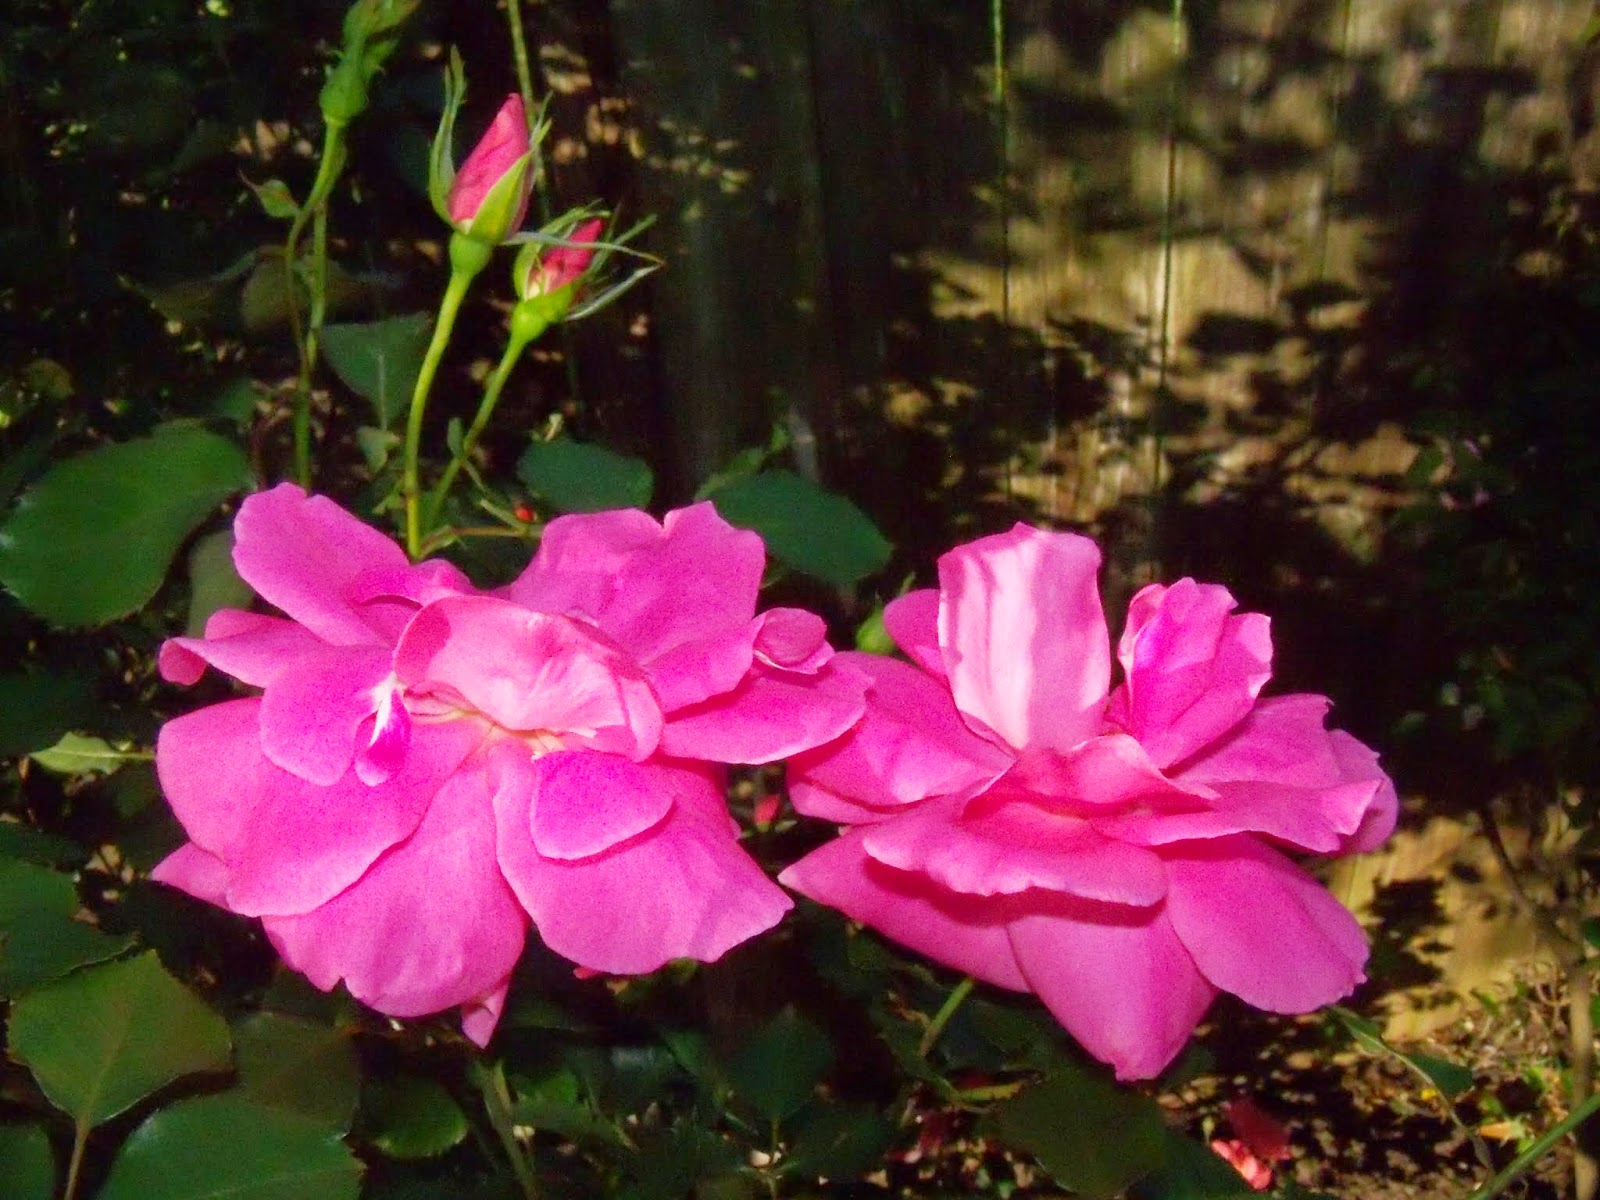 Gardening 2015 - 116_7642.JPG